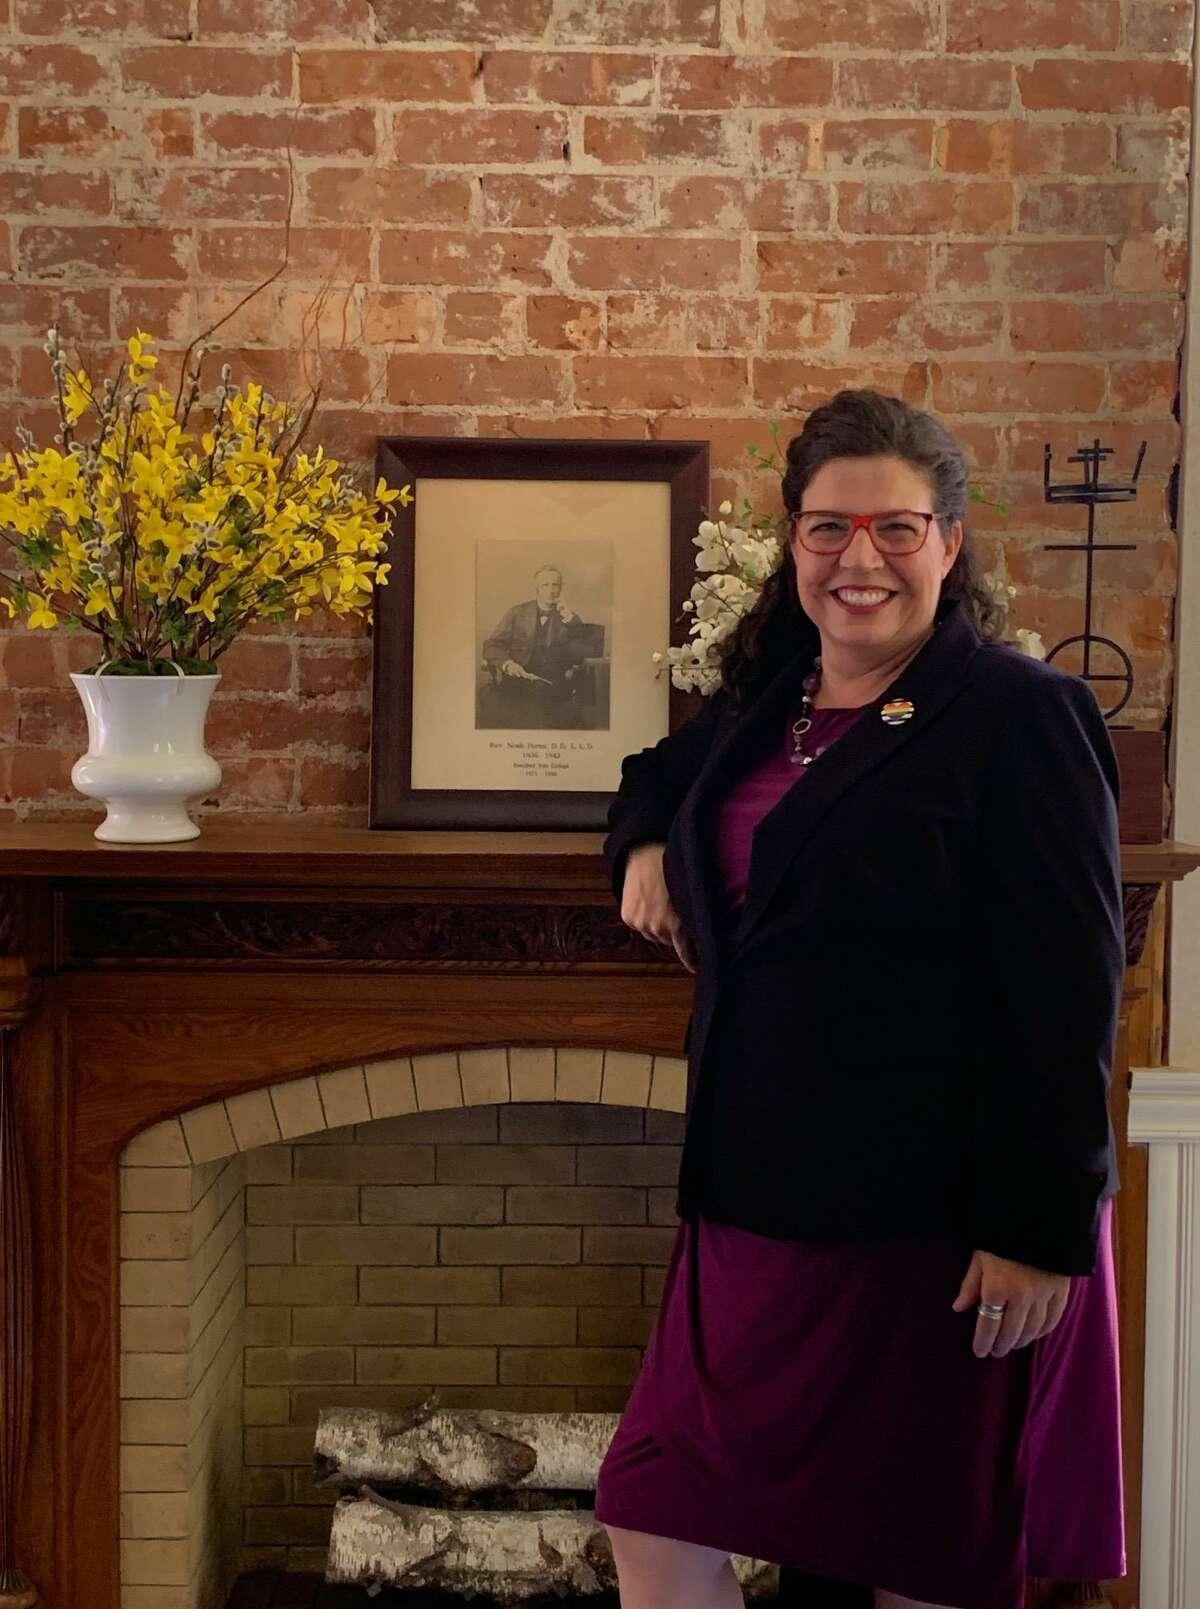 The Rev. Amy Carter